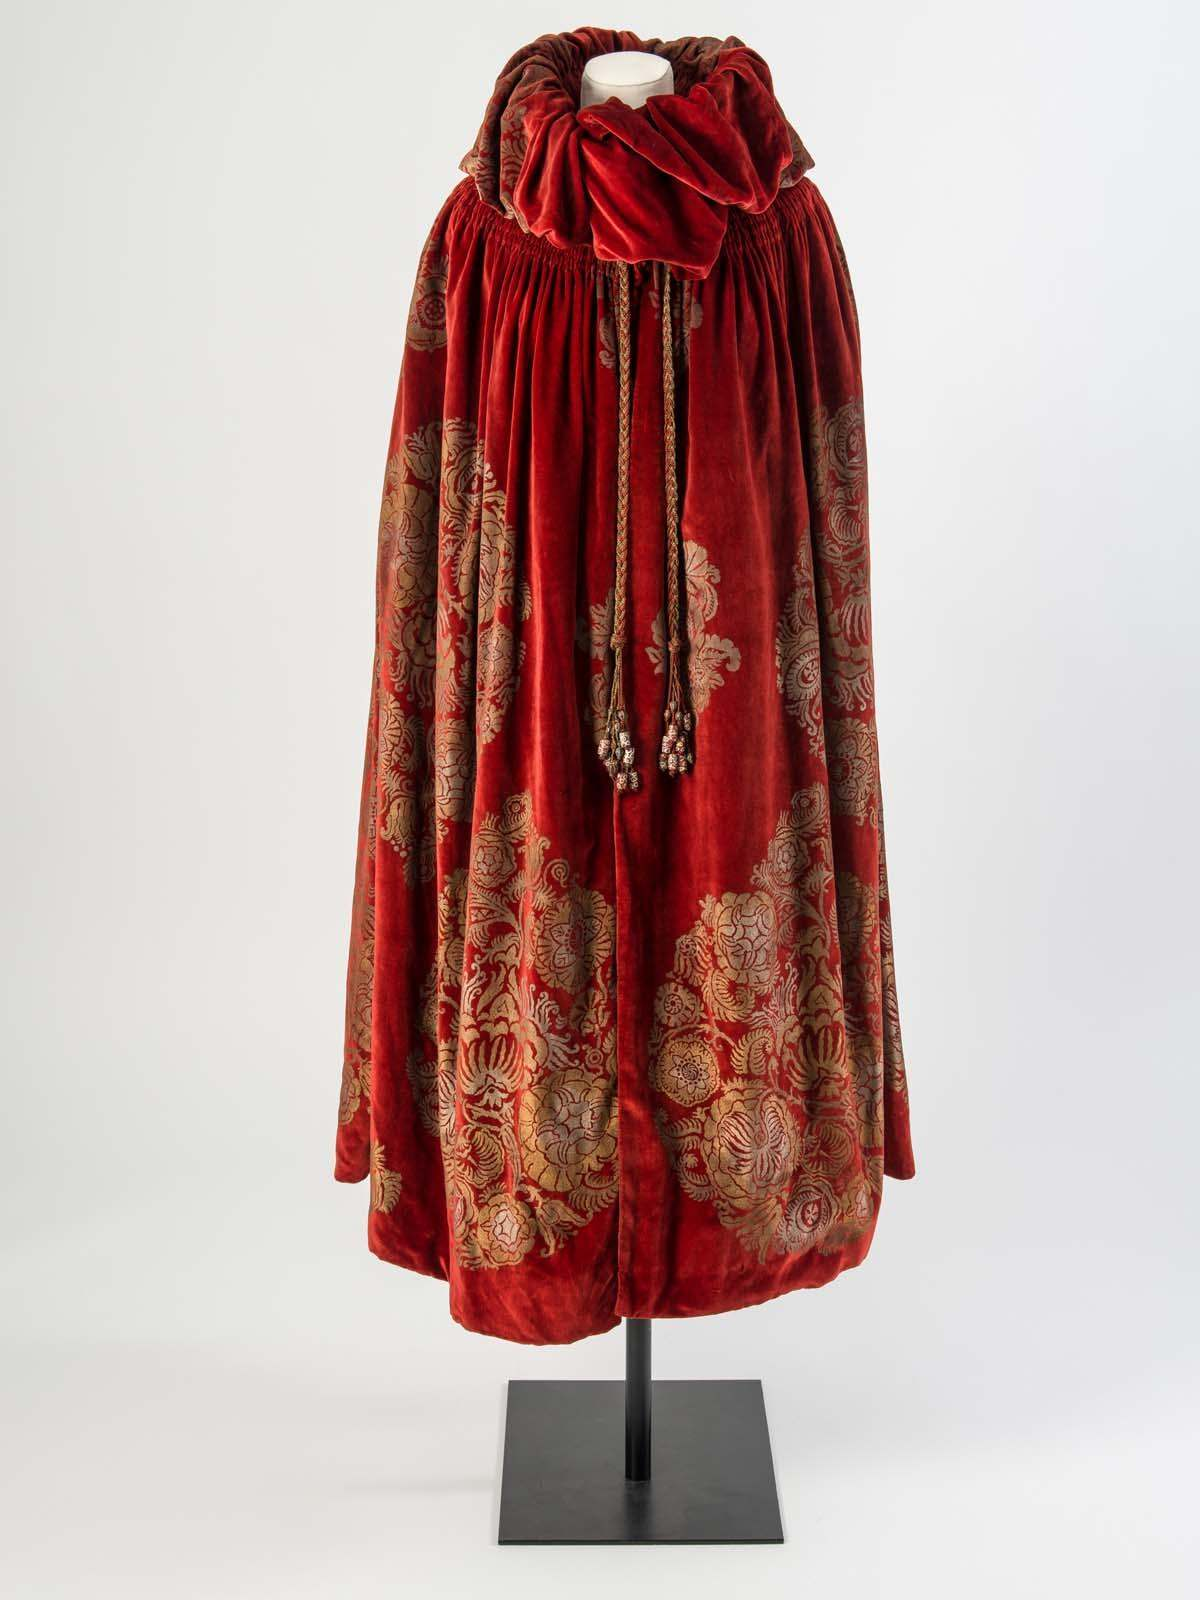 Cloak by Maria Monaci Gallenga, c.1923. Image via WordPress.